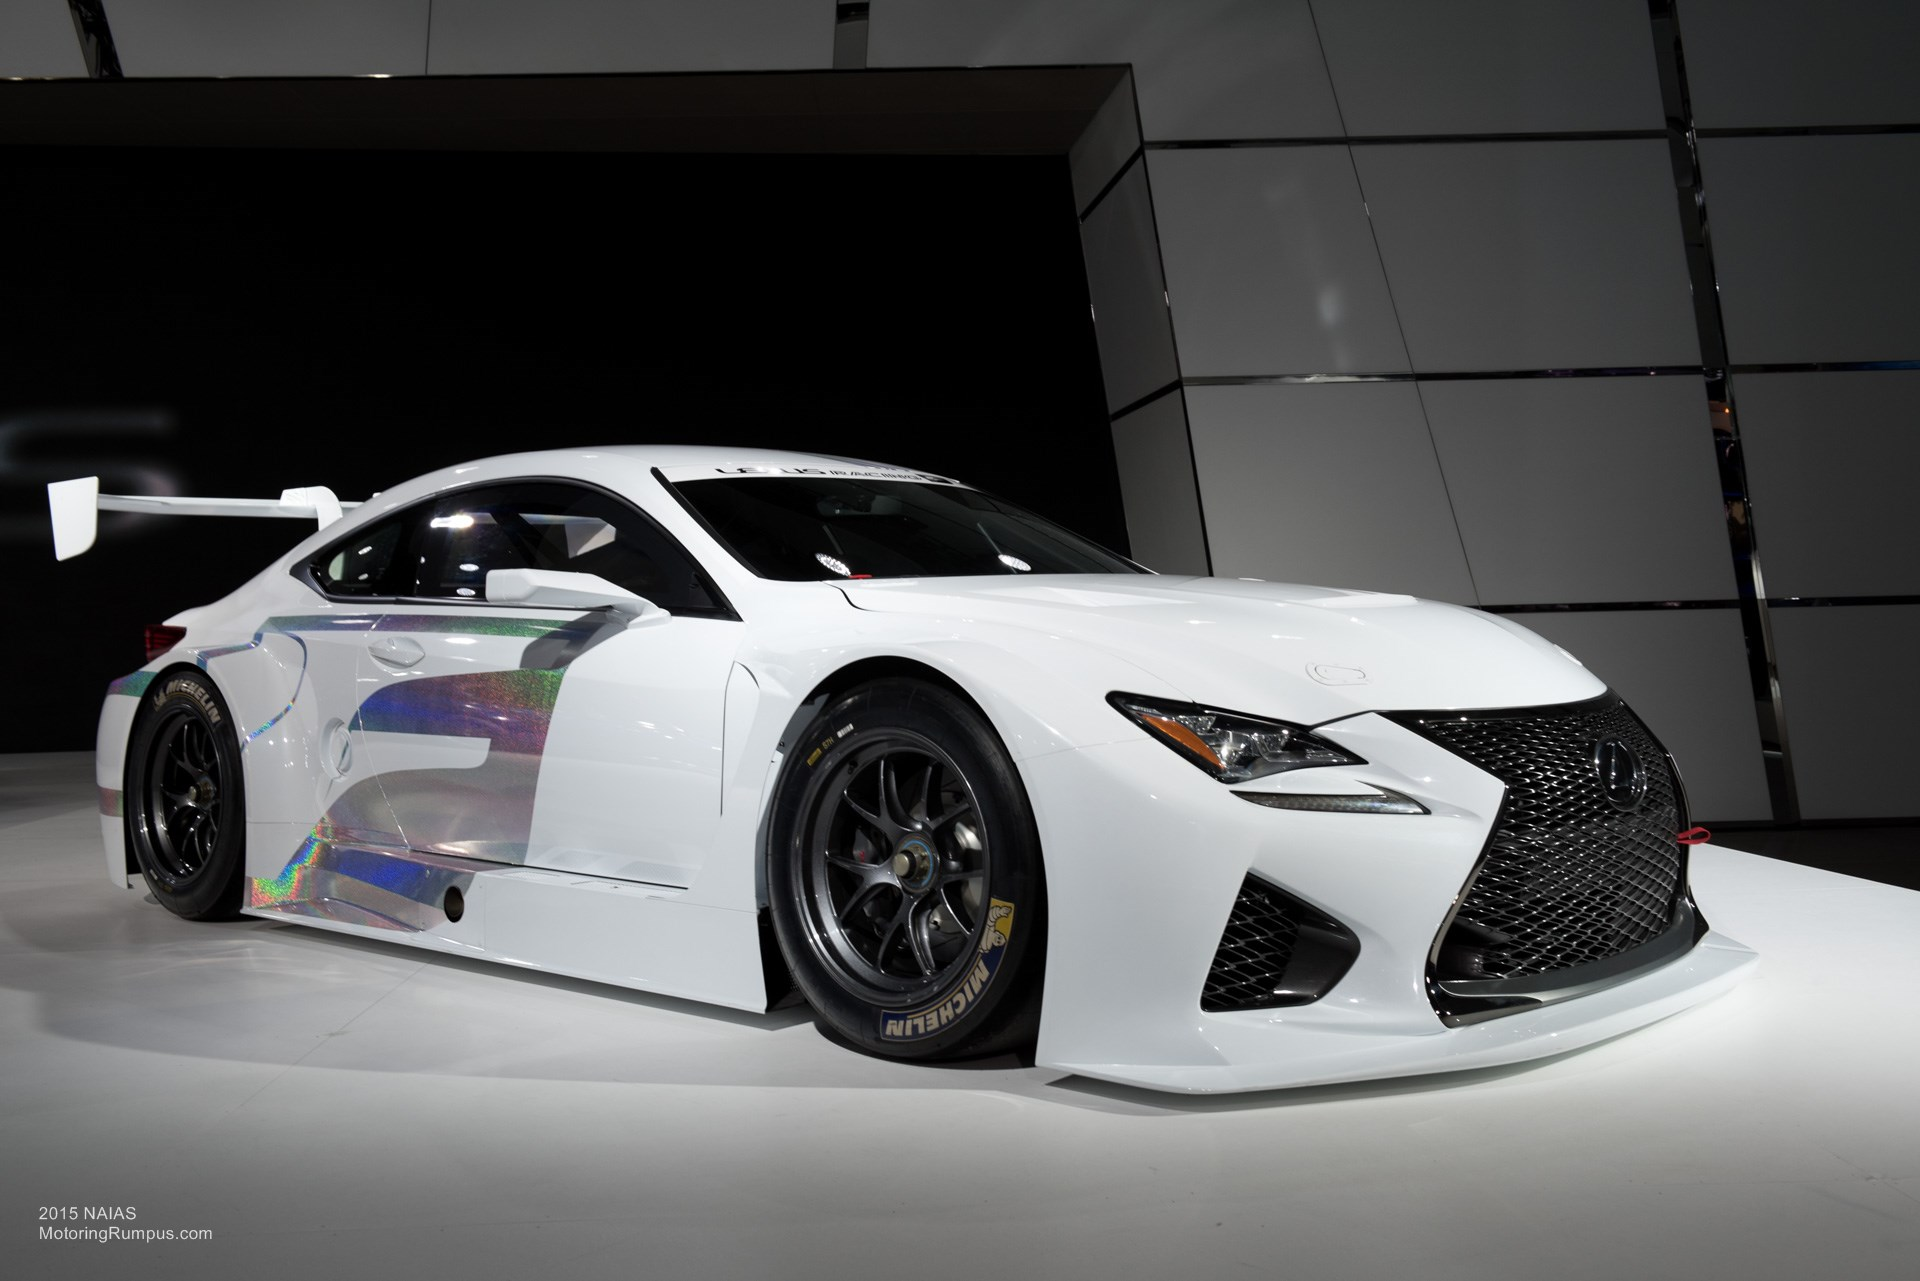 2015 NAIAS Lexus RC F GT3 Racing Concept